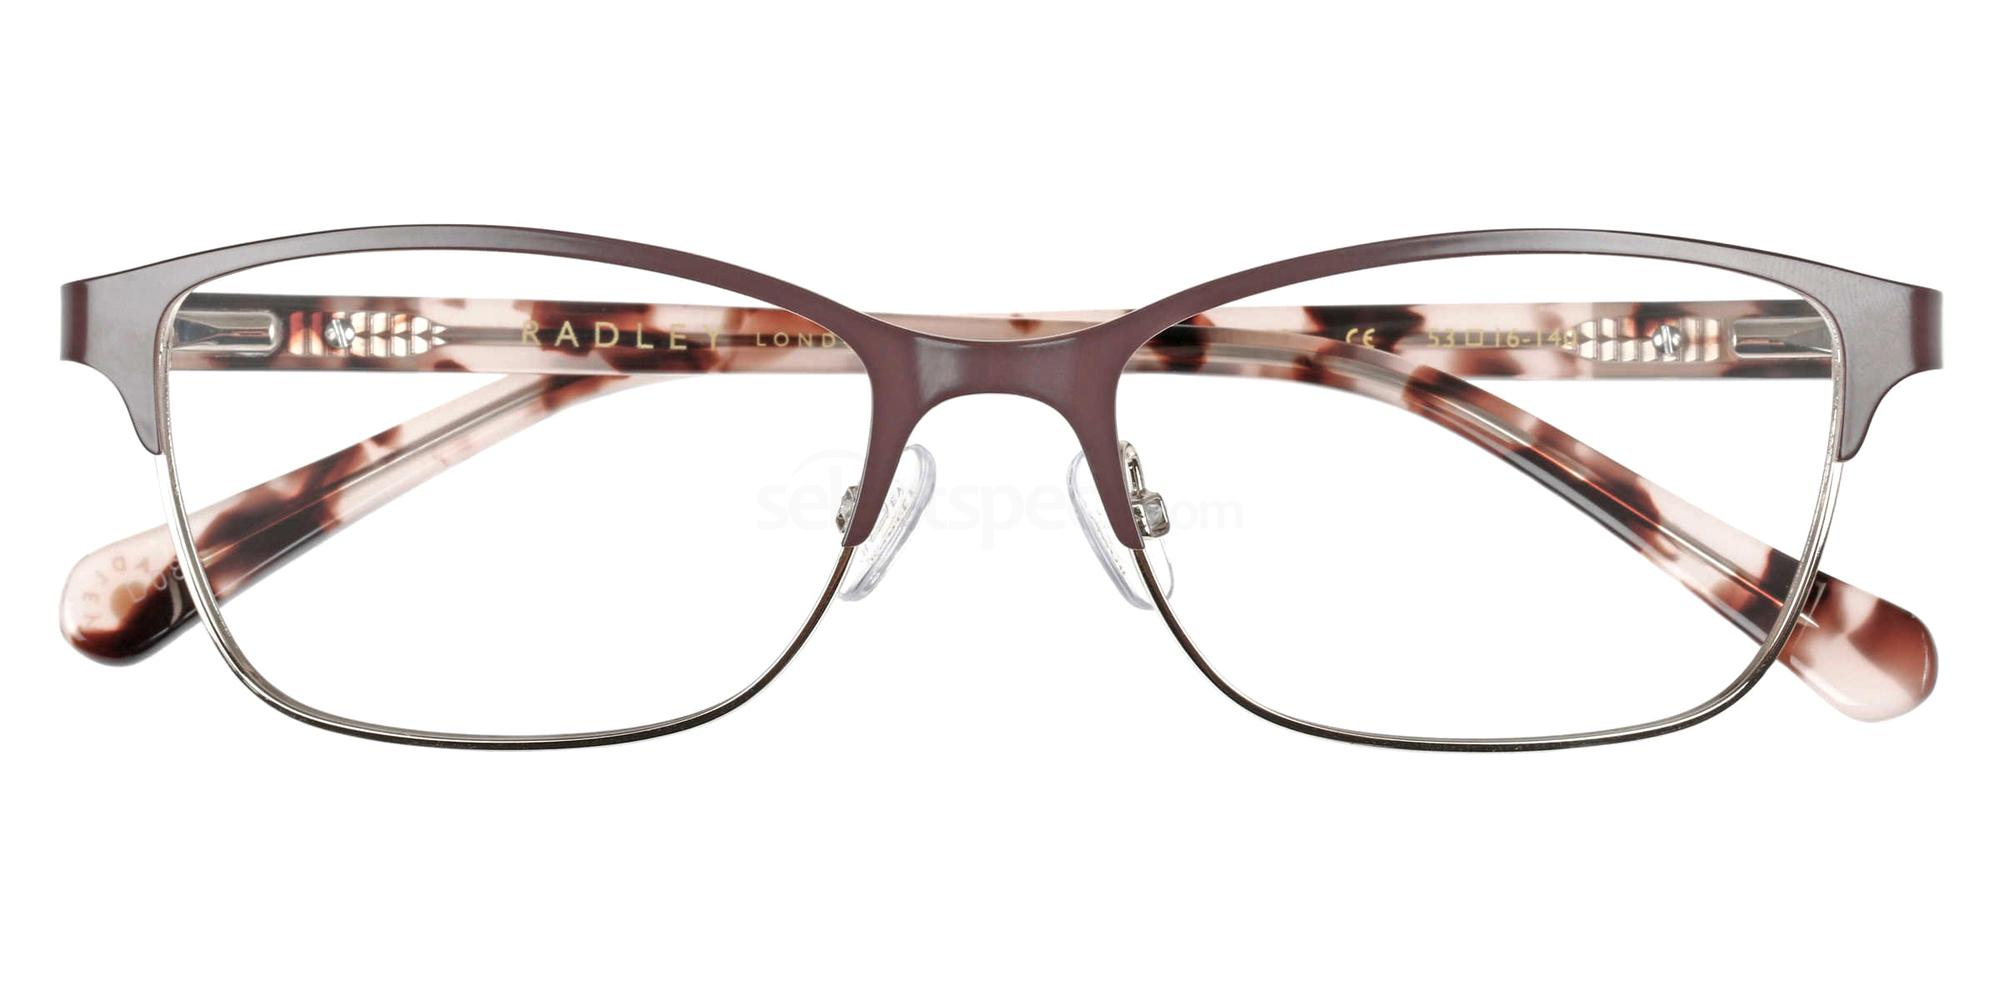 003 RDO-HAZEL Glasses, Radley London